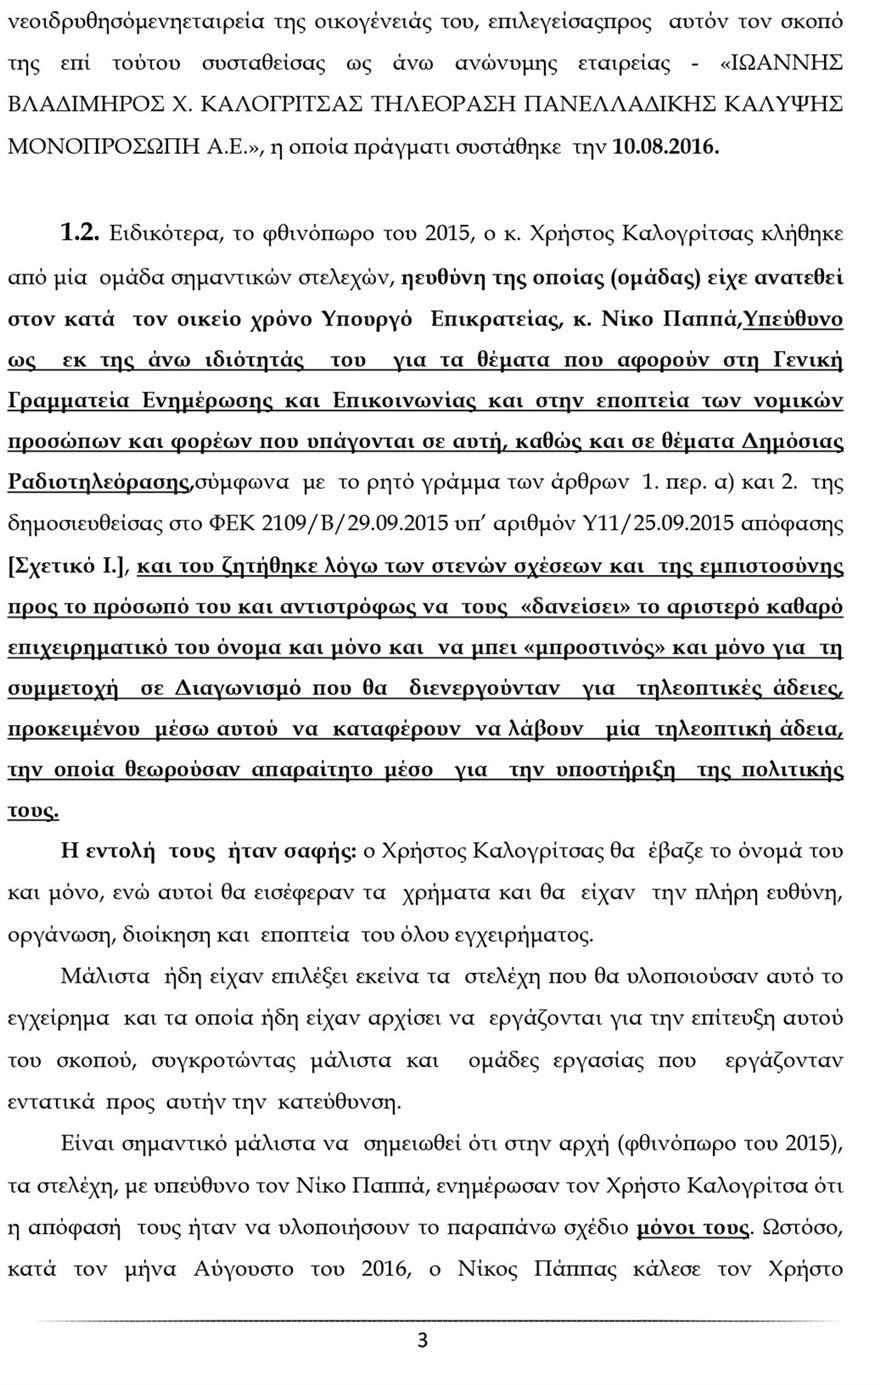 ypomnima-3